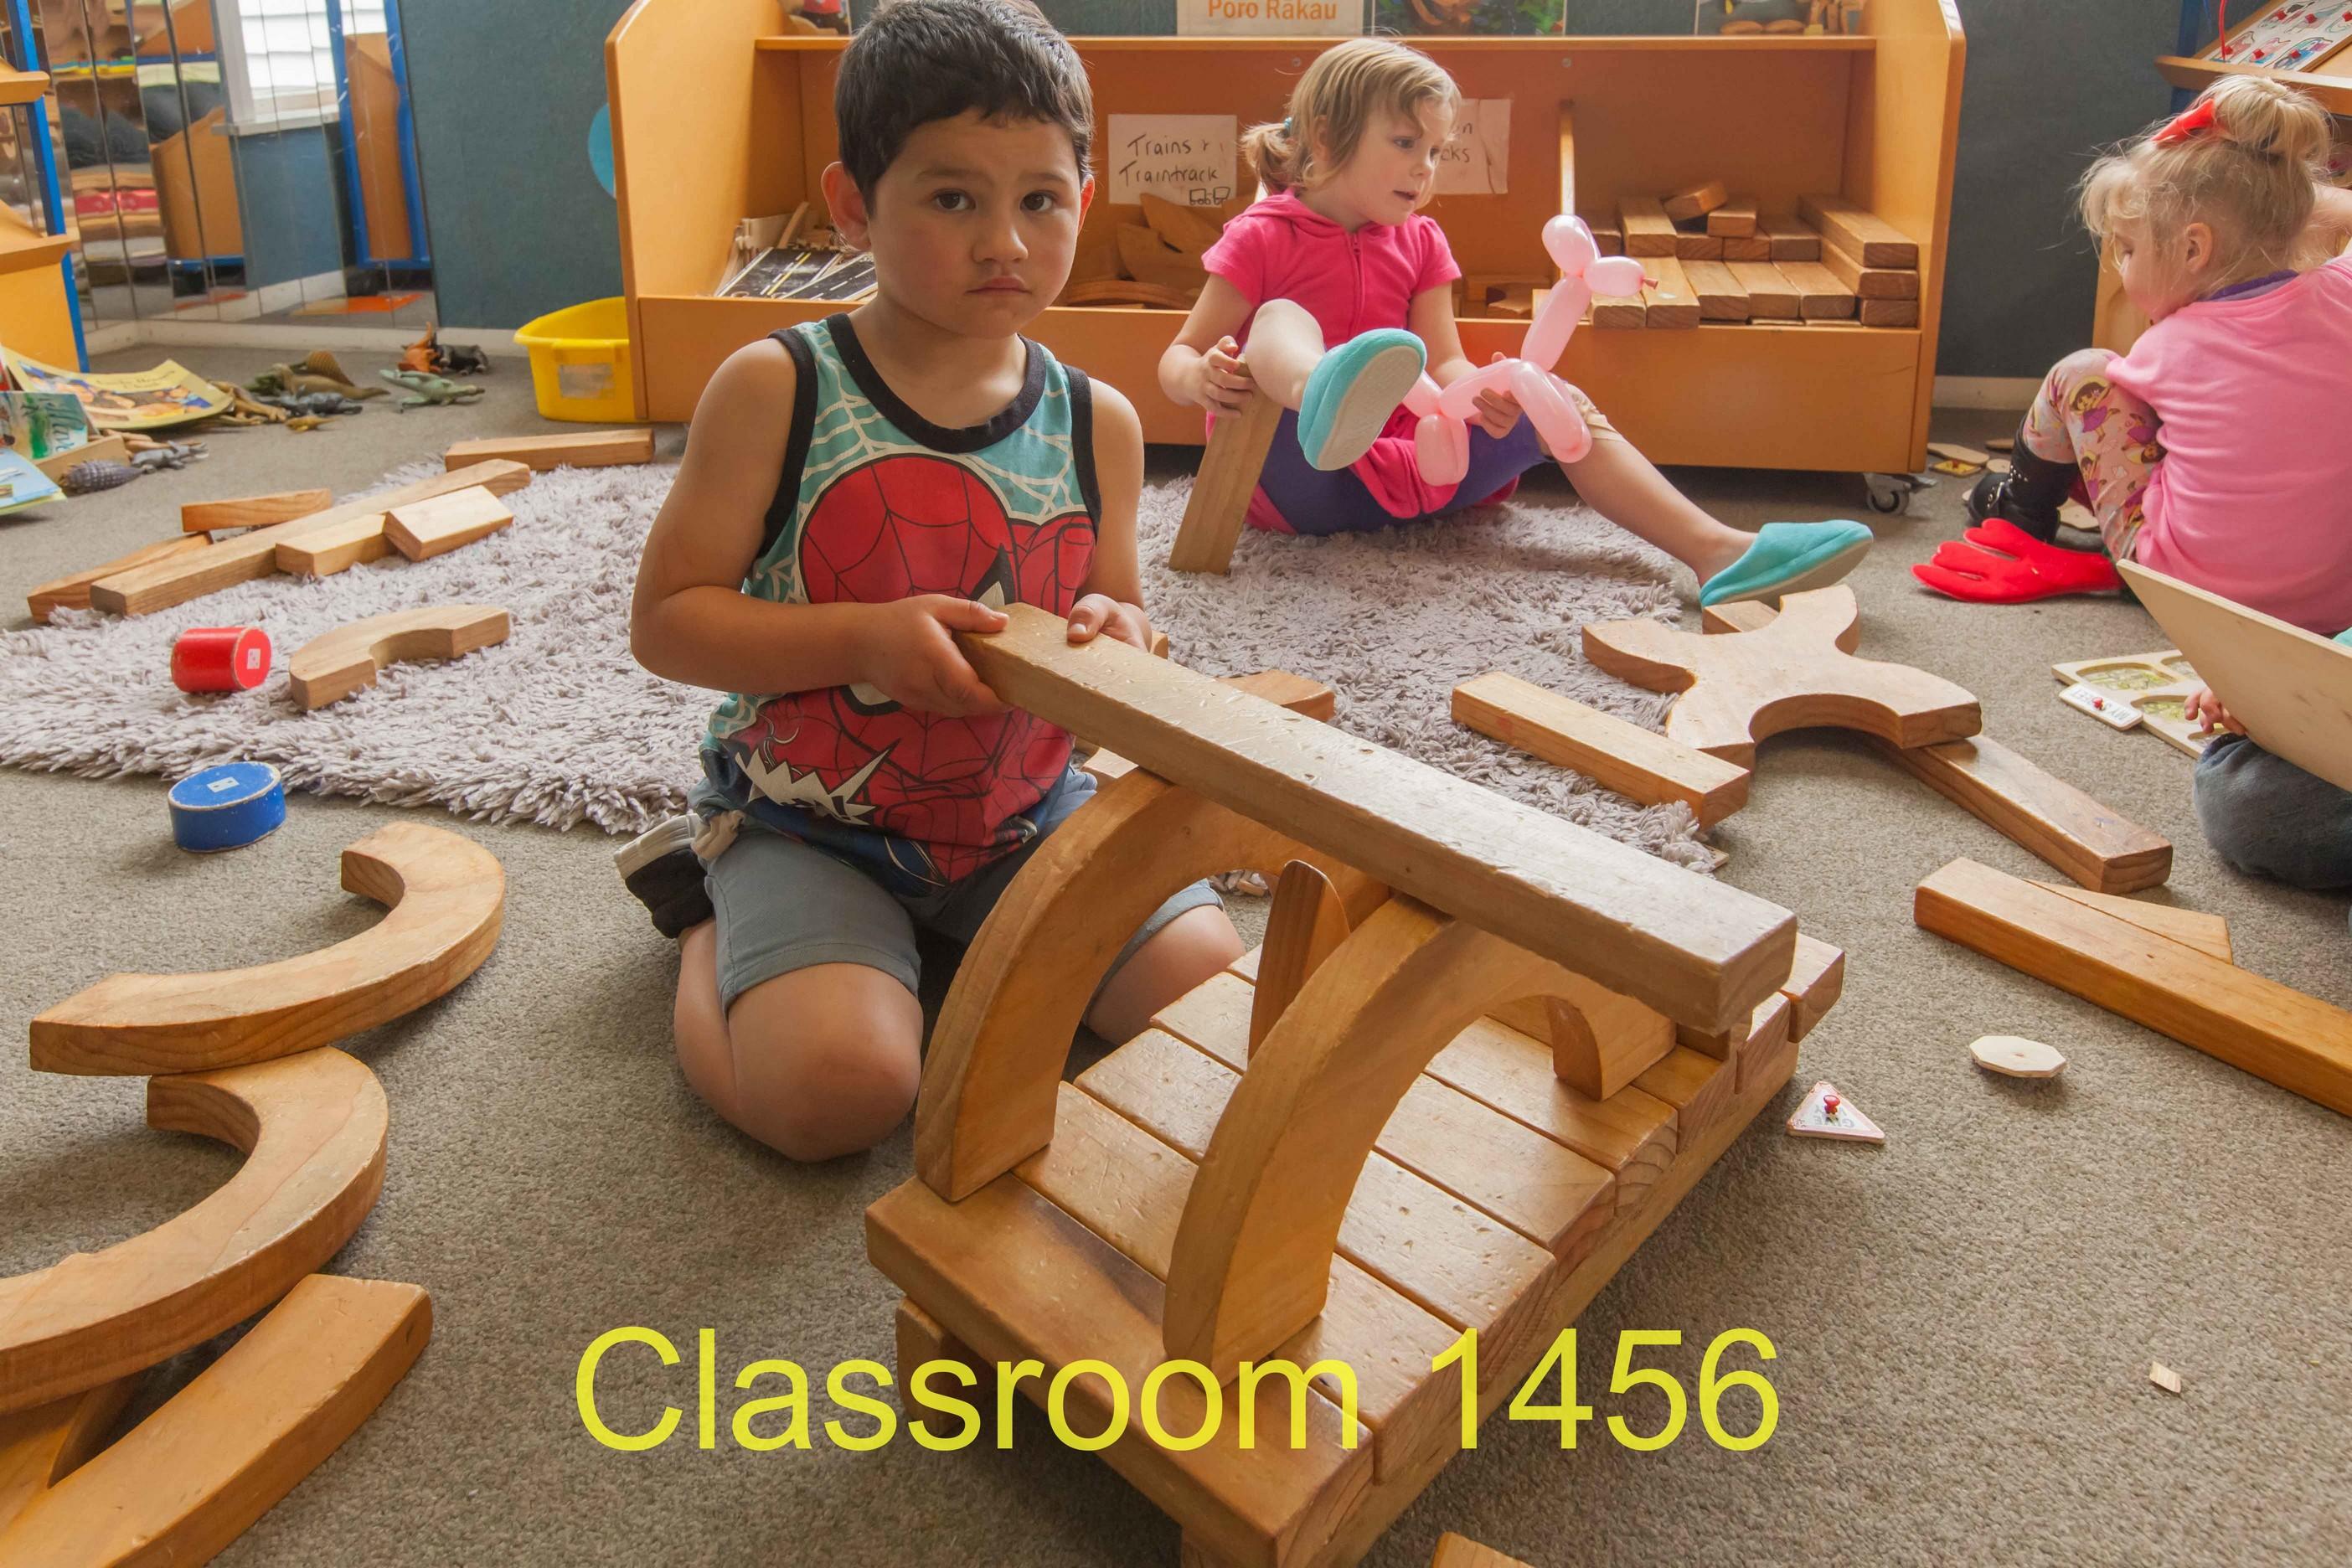 Classroom 1456